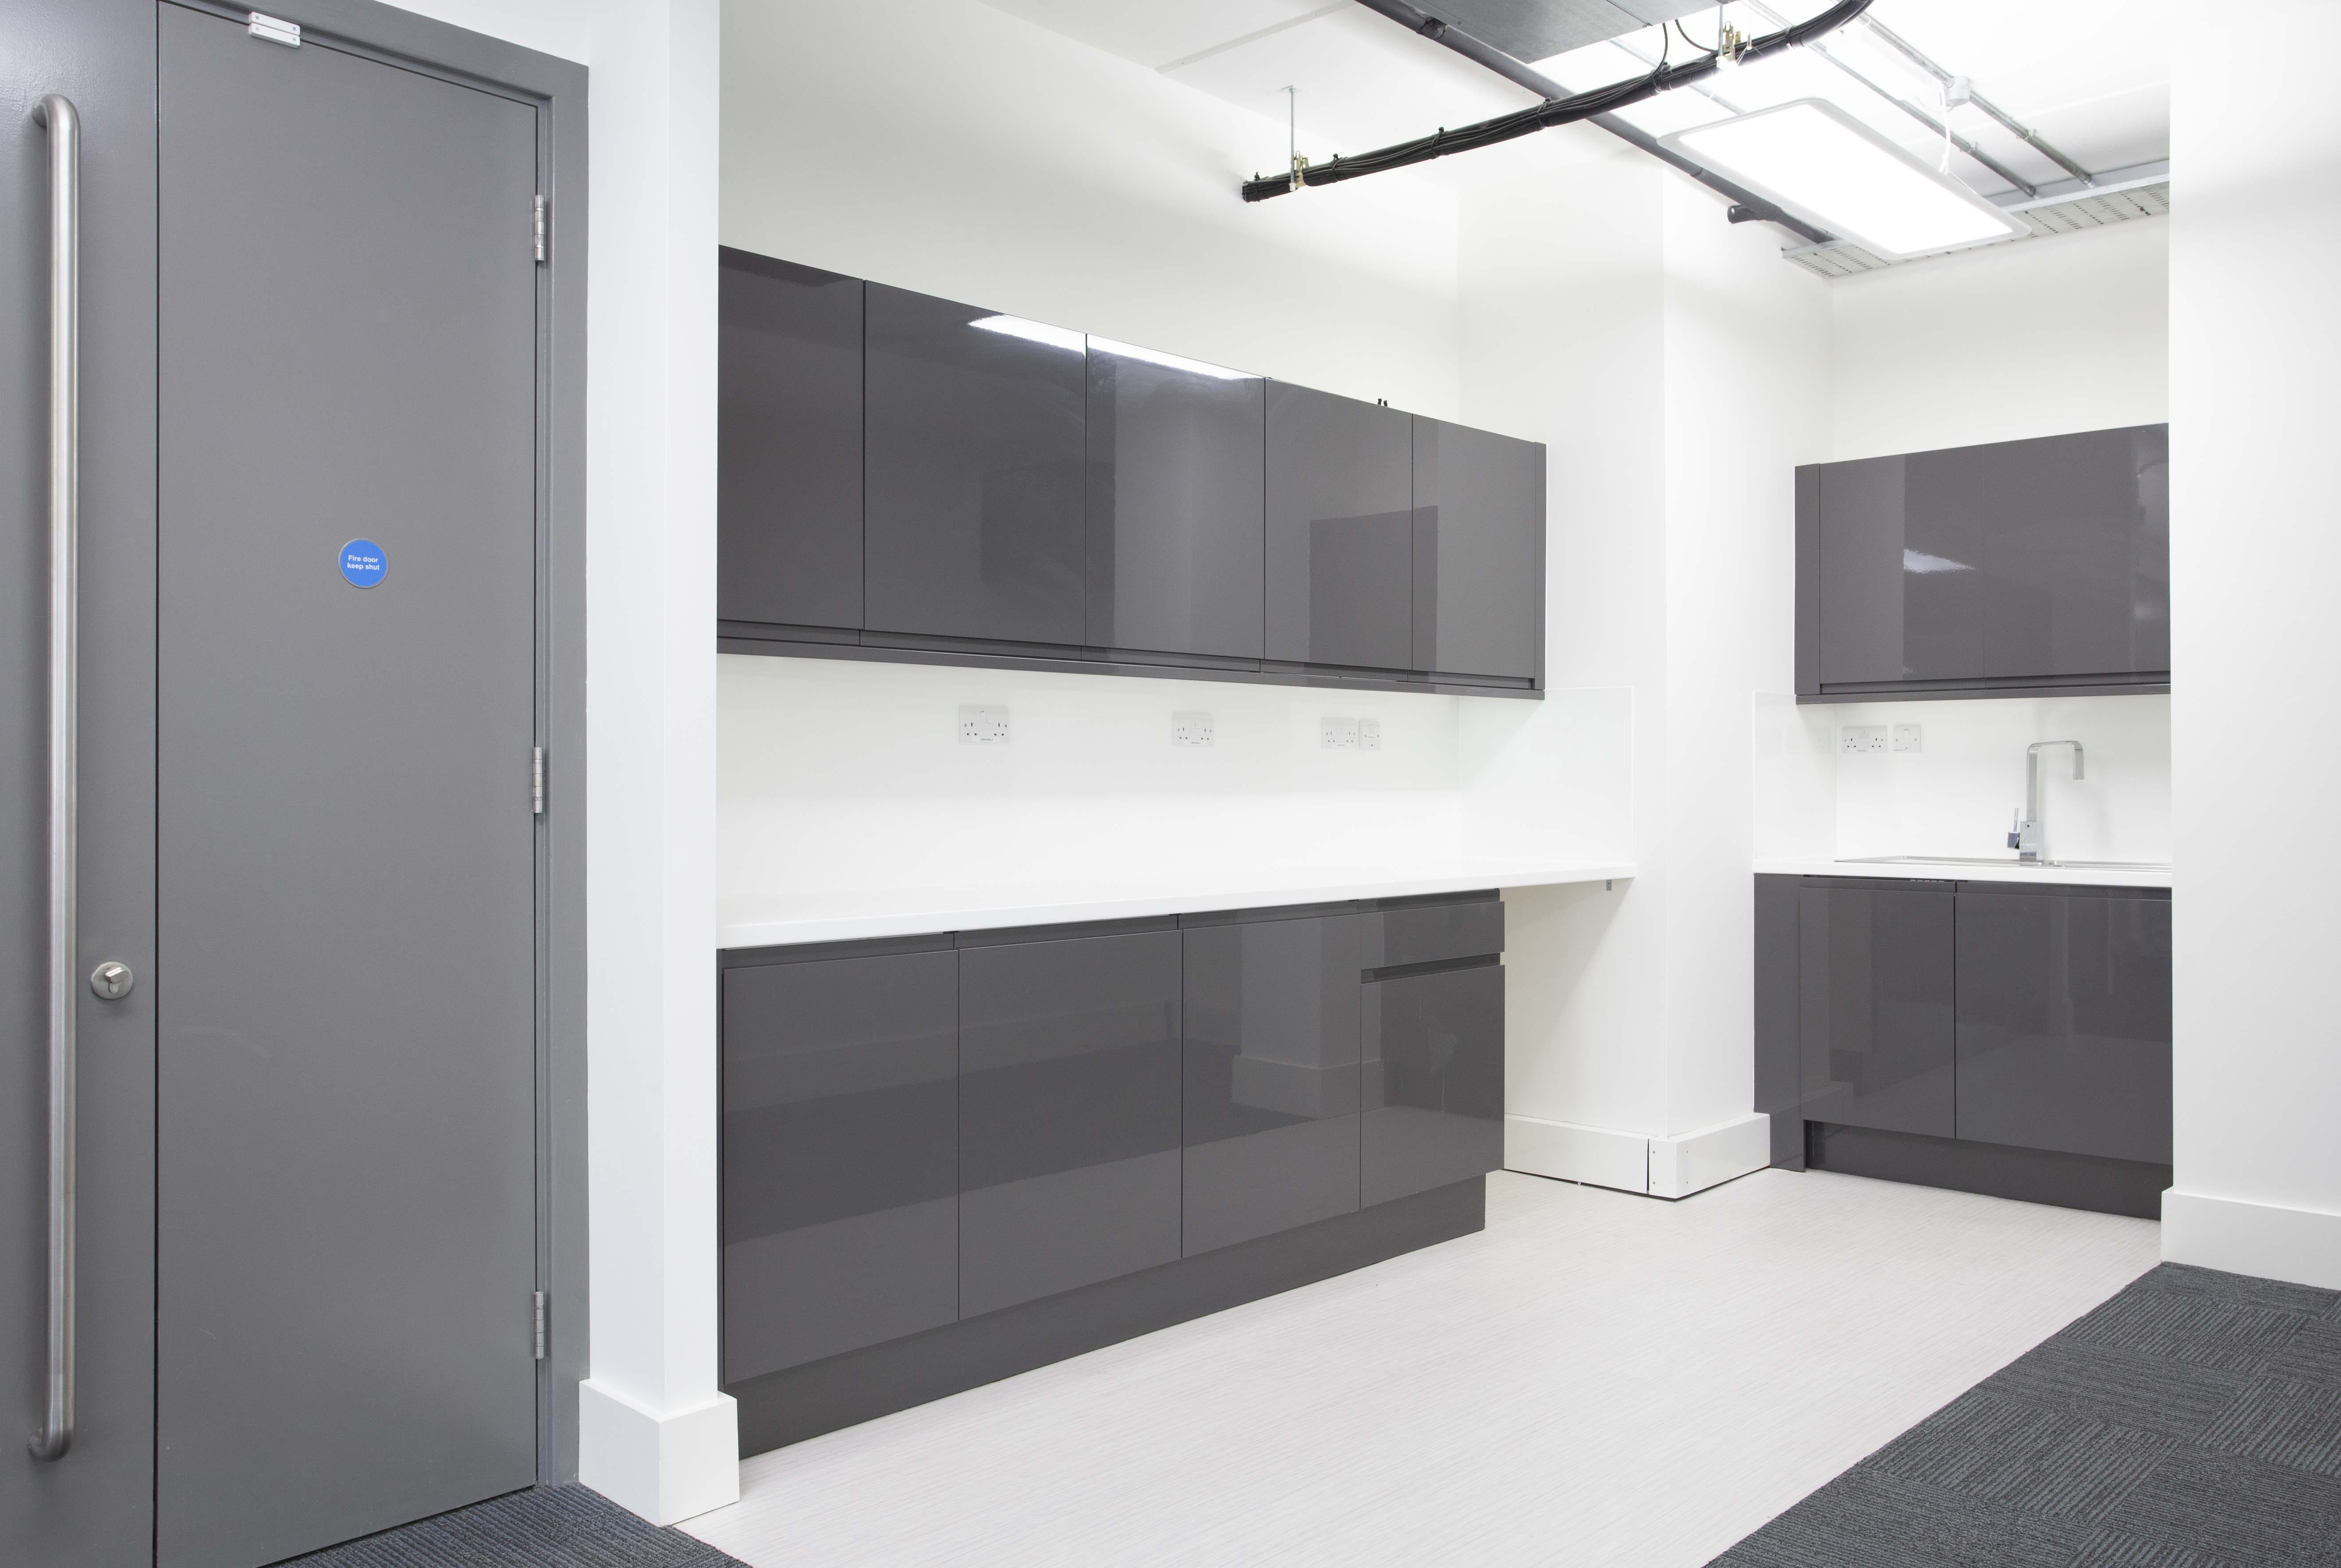 Suite G4, 329 Bracknell, Bracknell, Offices To Let - 329 G4 internals_0412.jpg